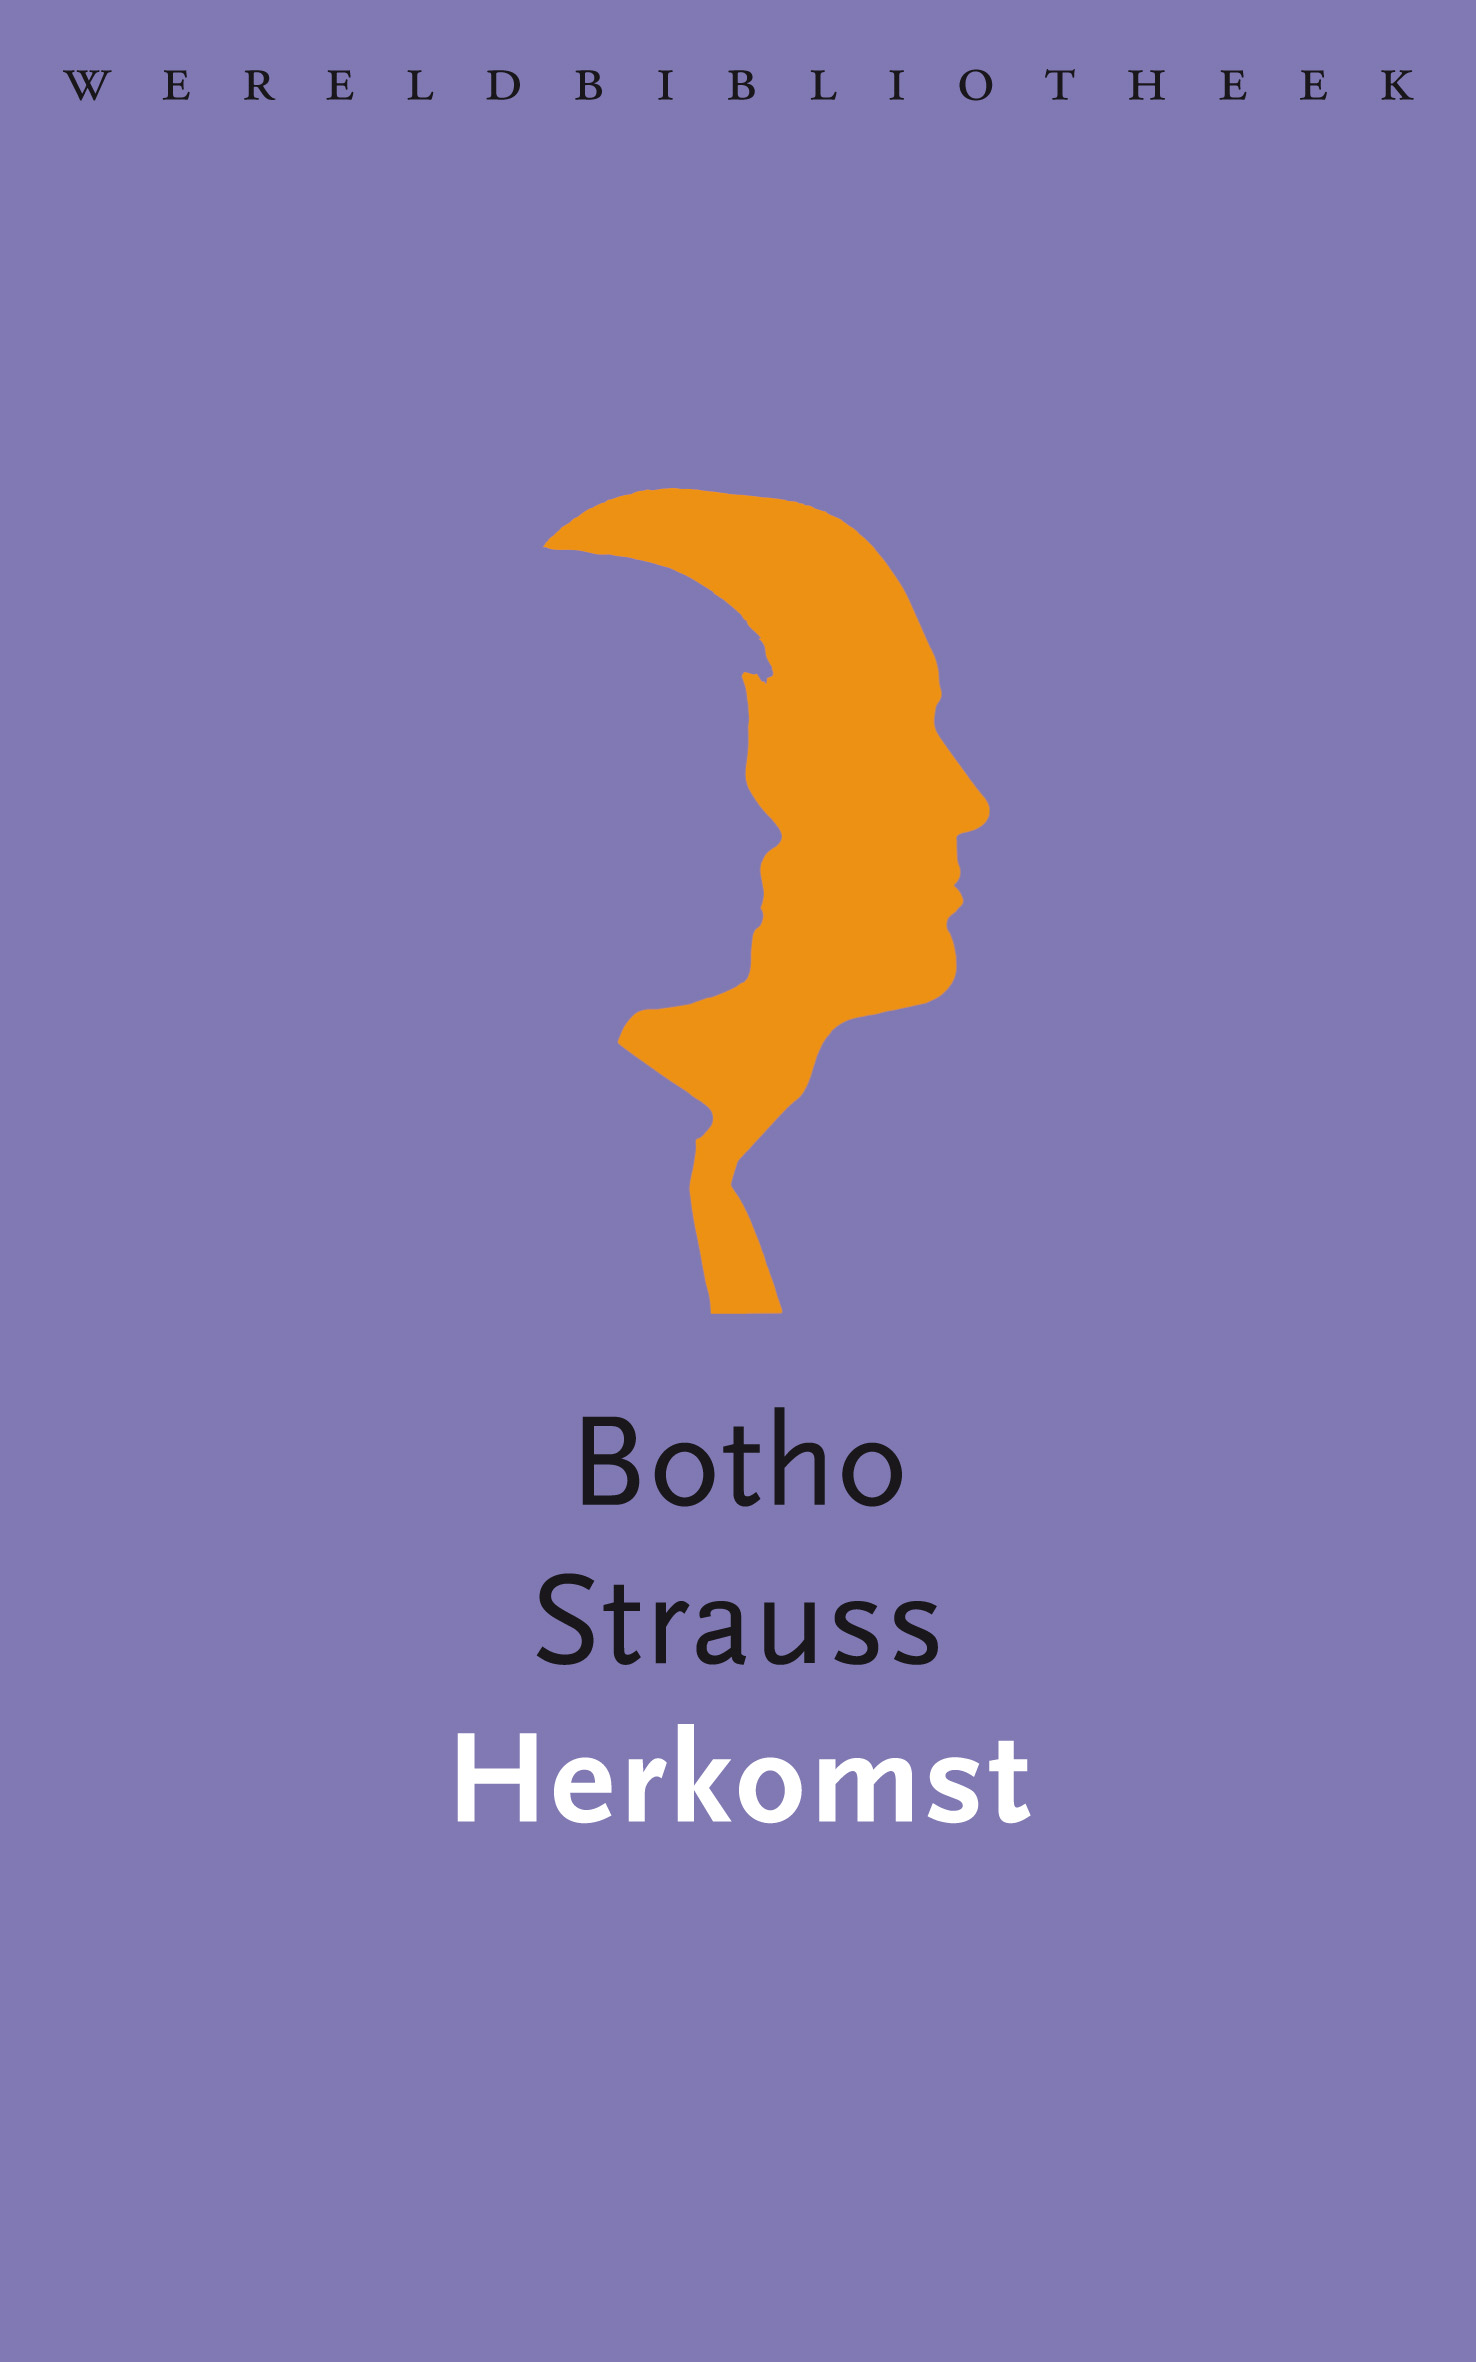 Herkomst – Botho Strauss